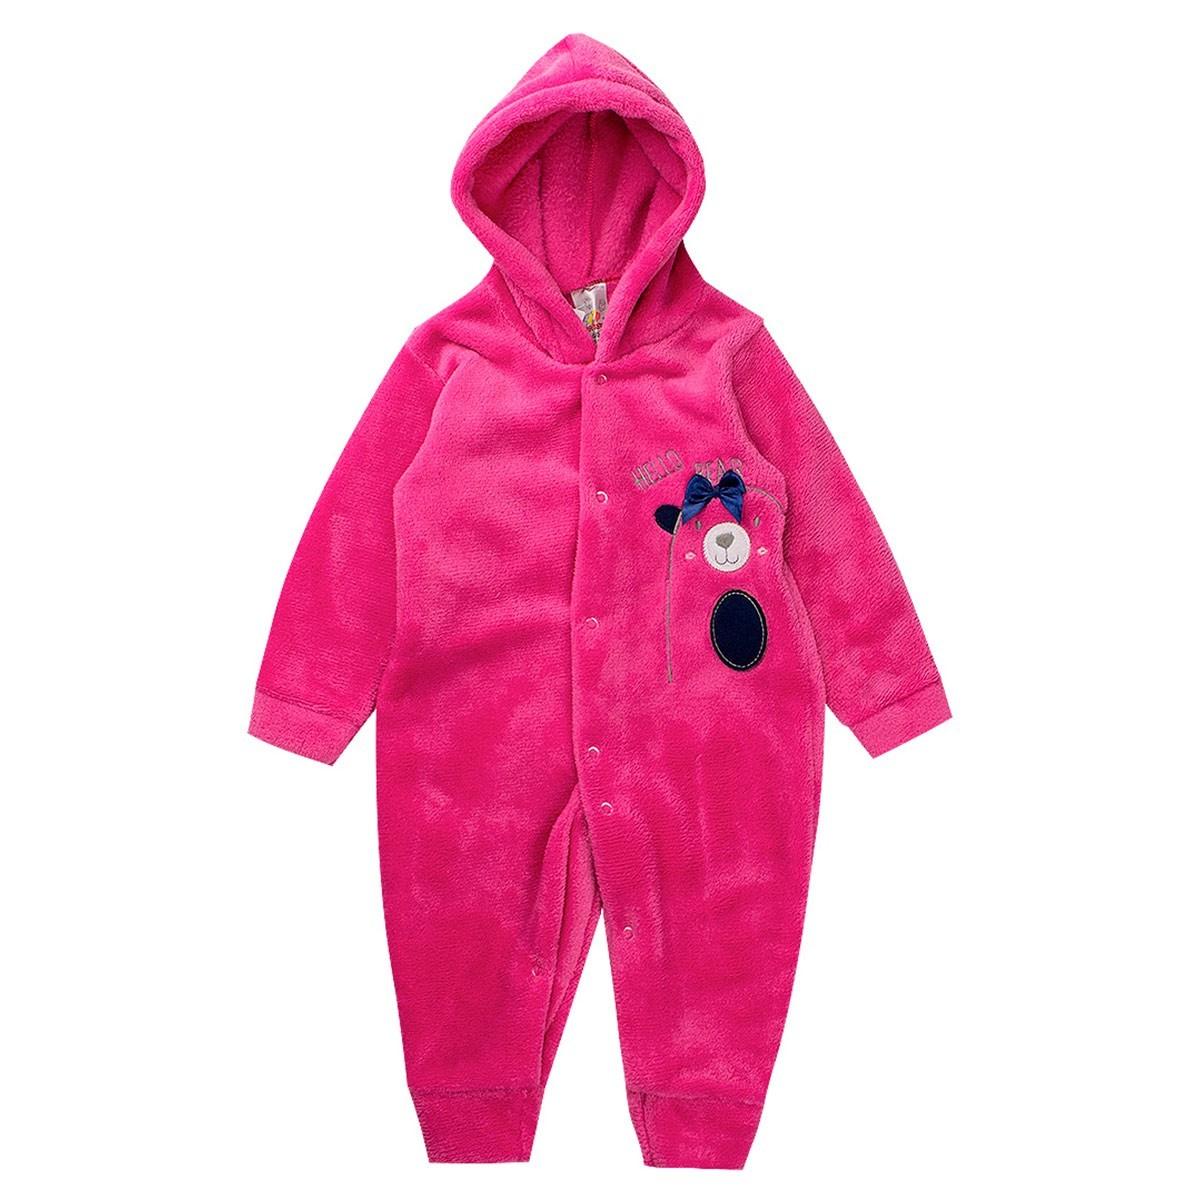 Macaquinho Bebê Menina Plush Antialérgico Pink - Isensee